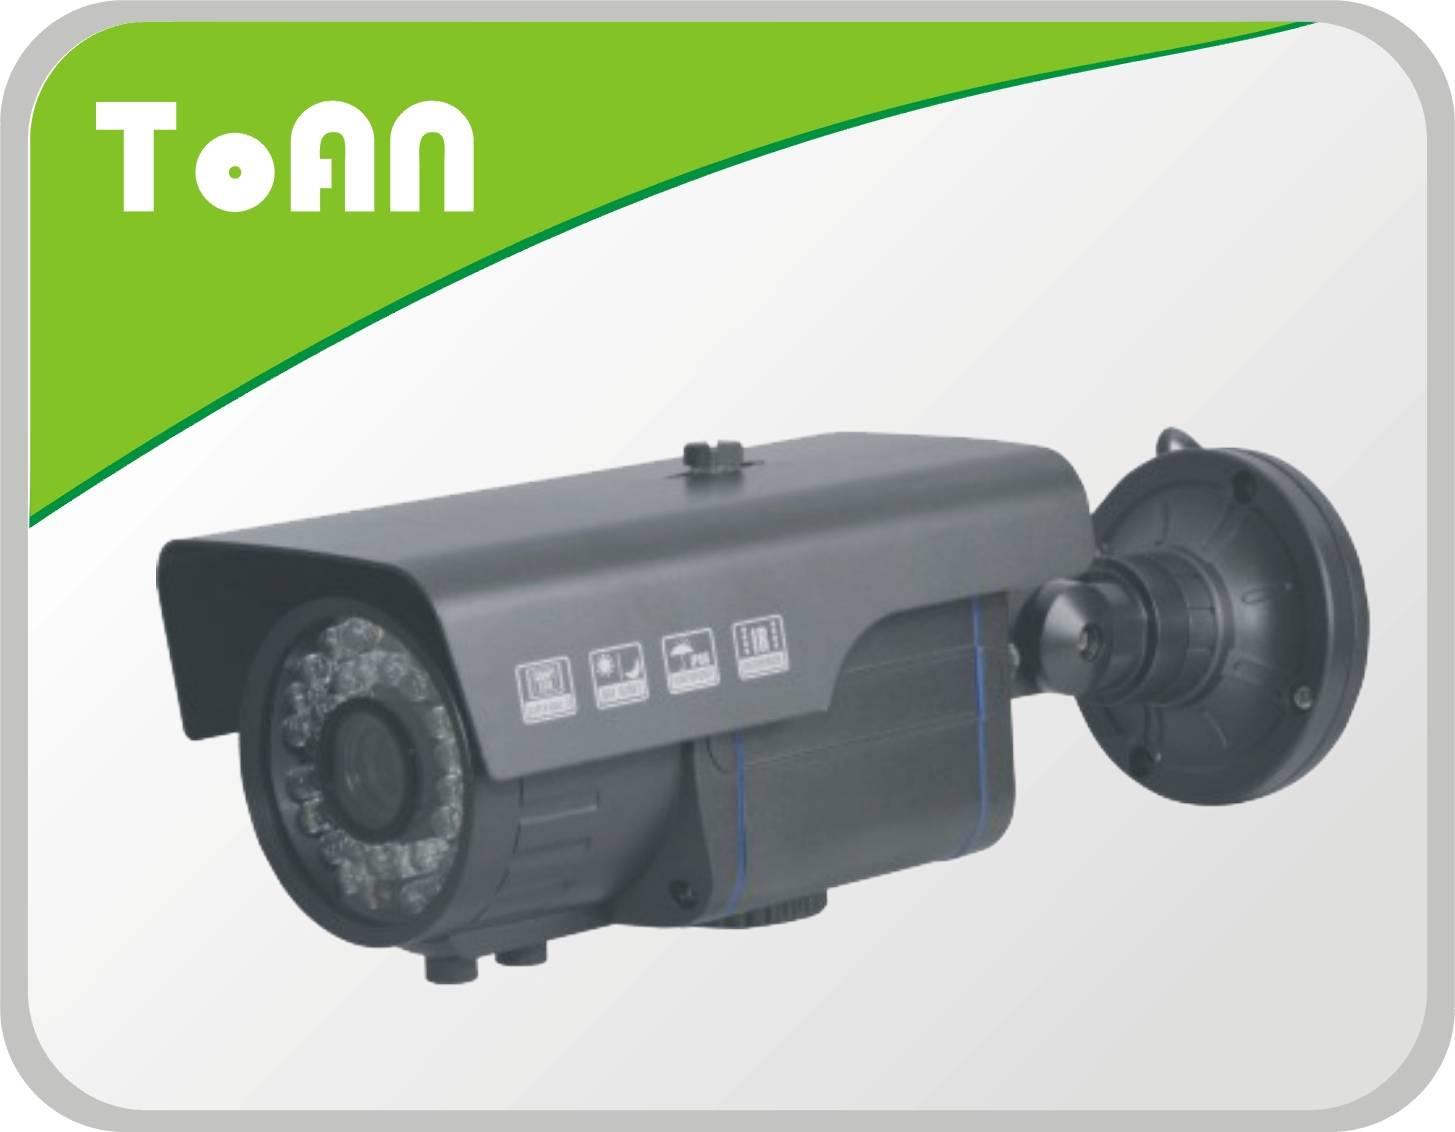 TOAN Sony Effio-E 700/600/420tvl cctv Professional Camera sony ip66 camera old professional camera